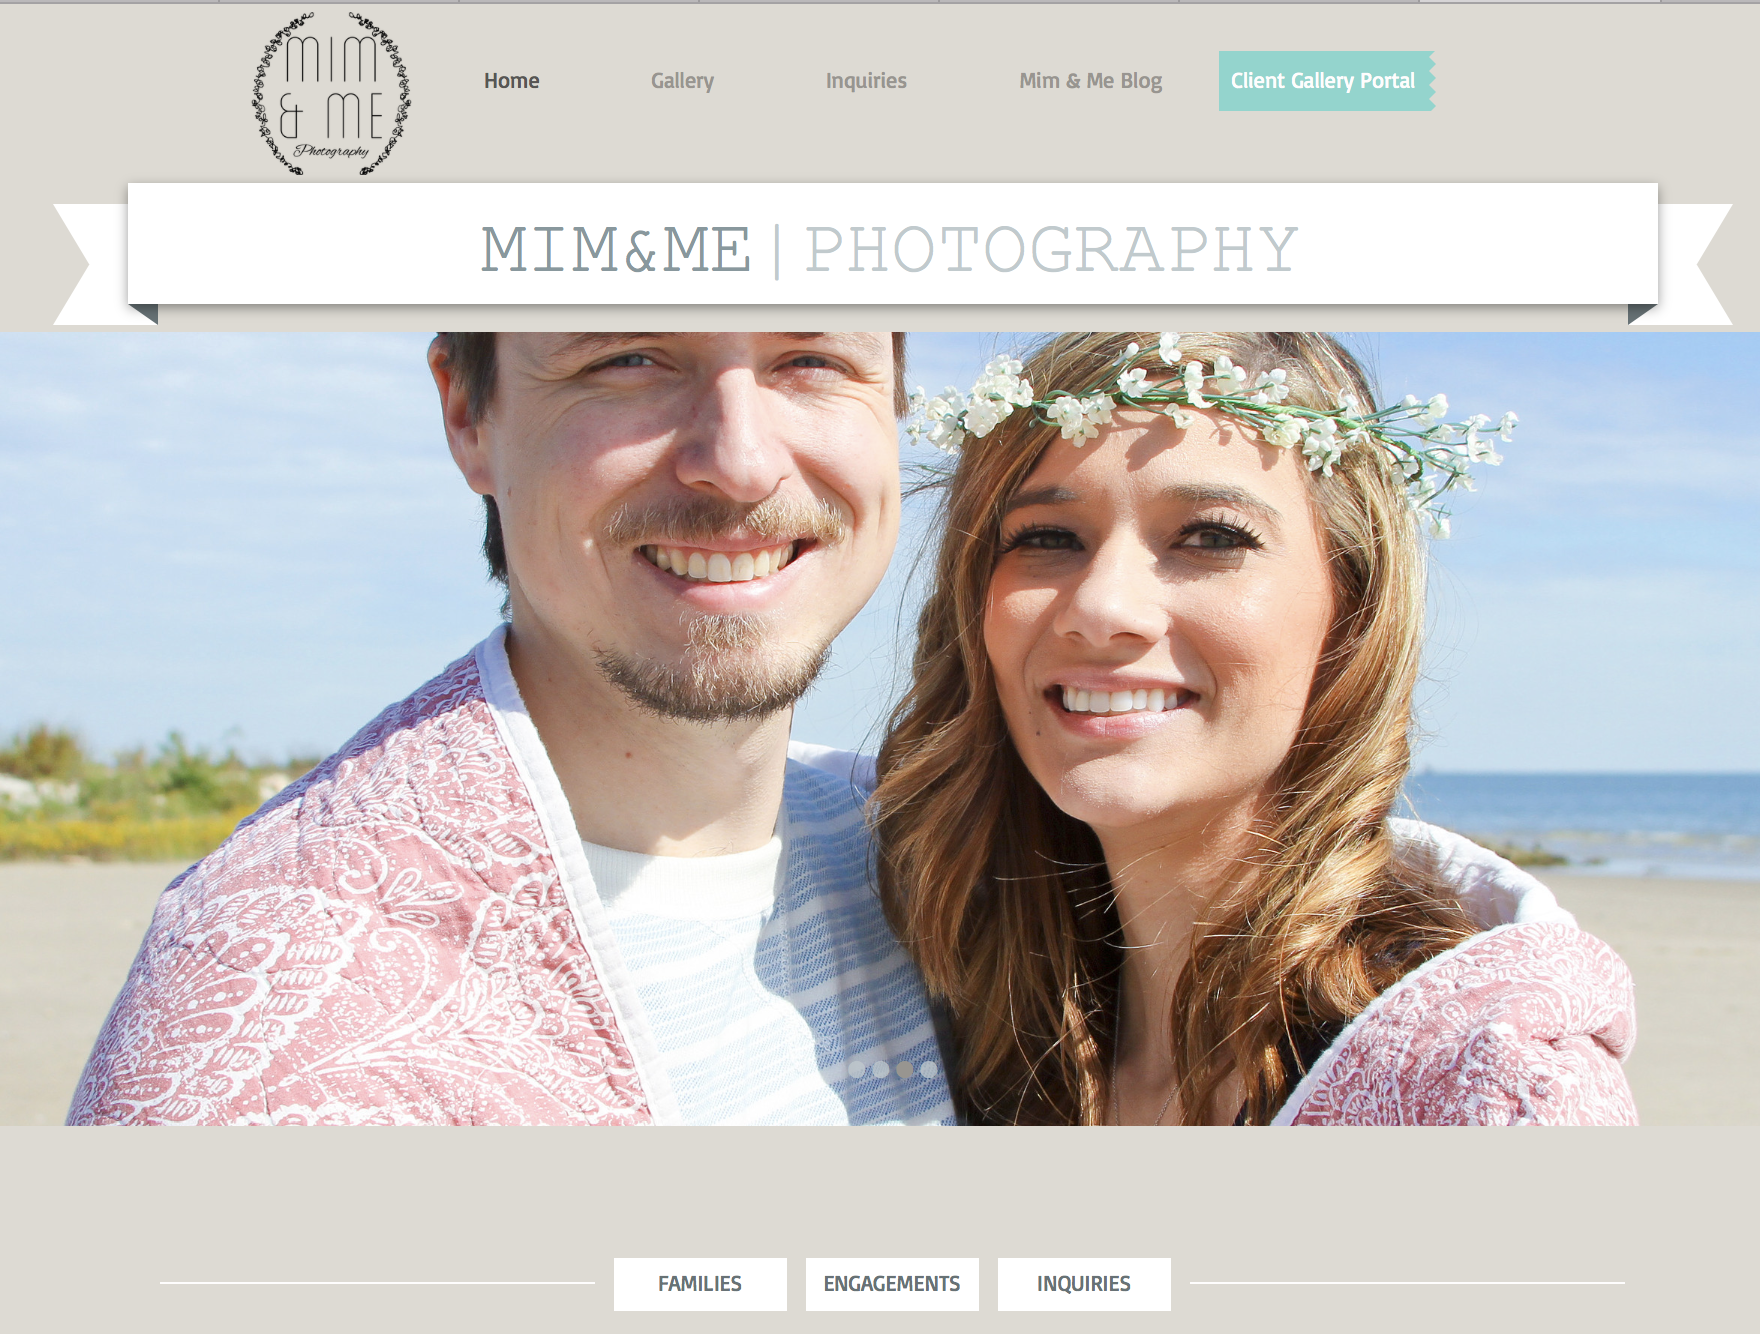 Mim & Me Photography